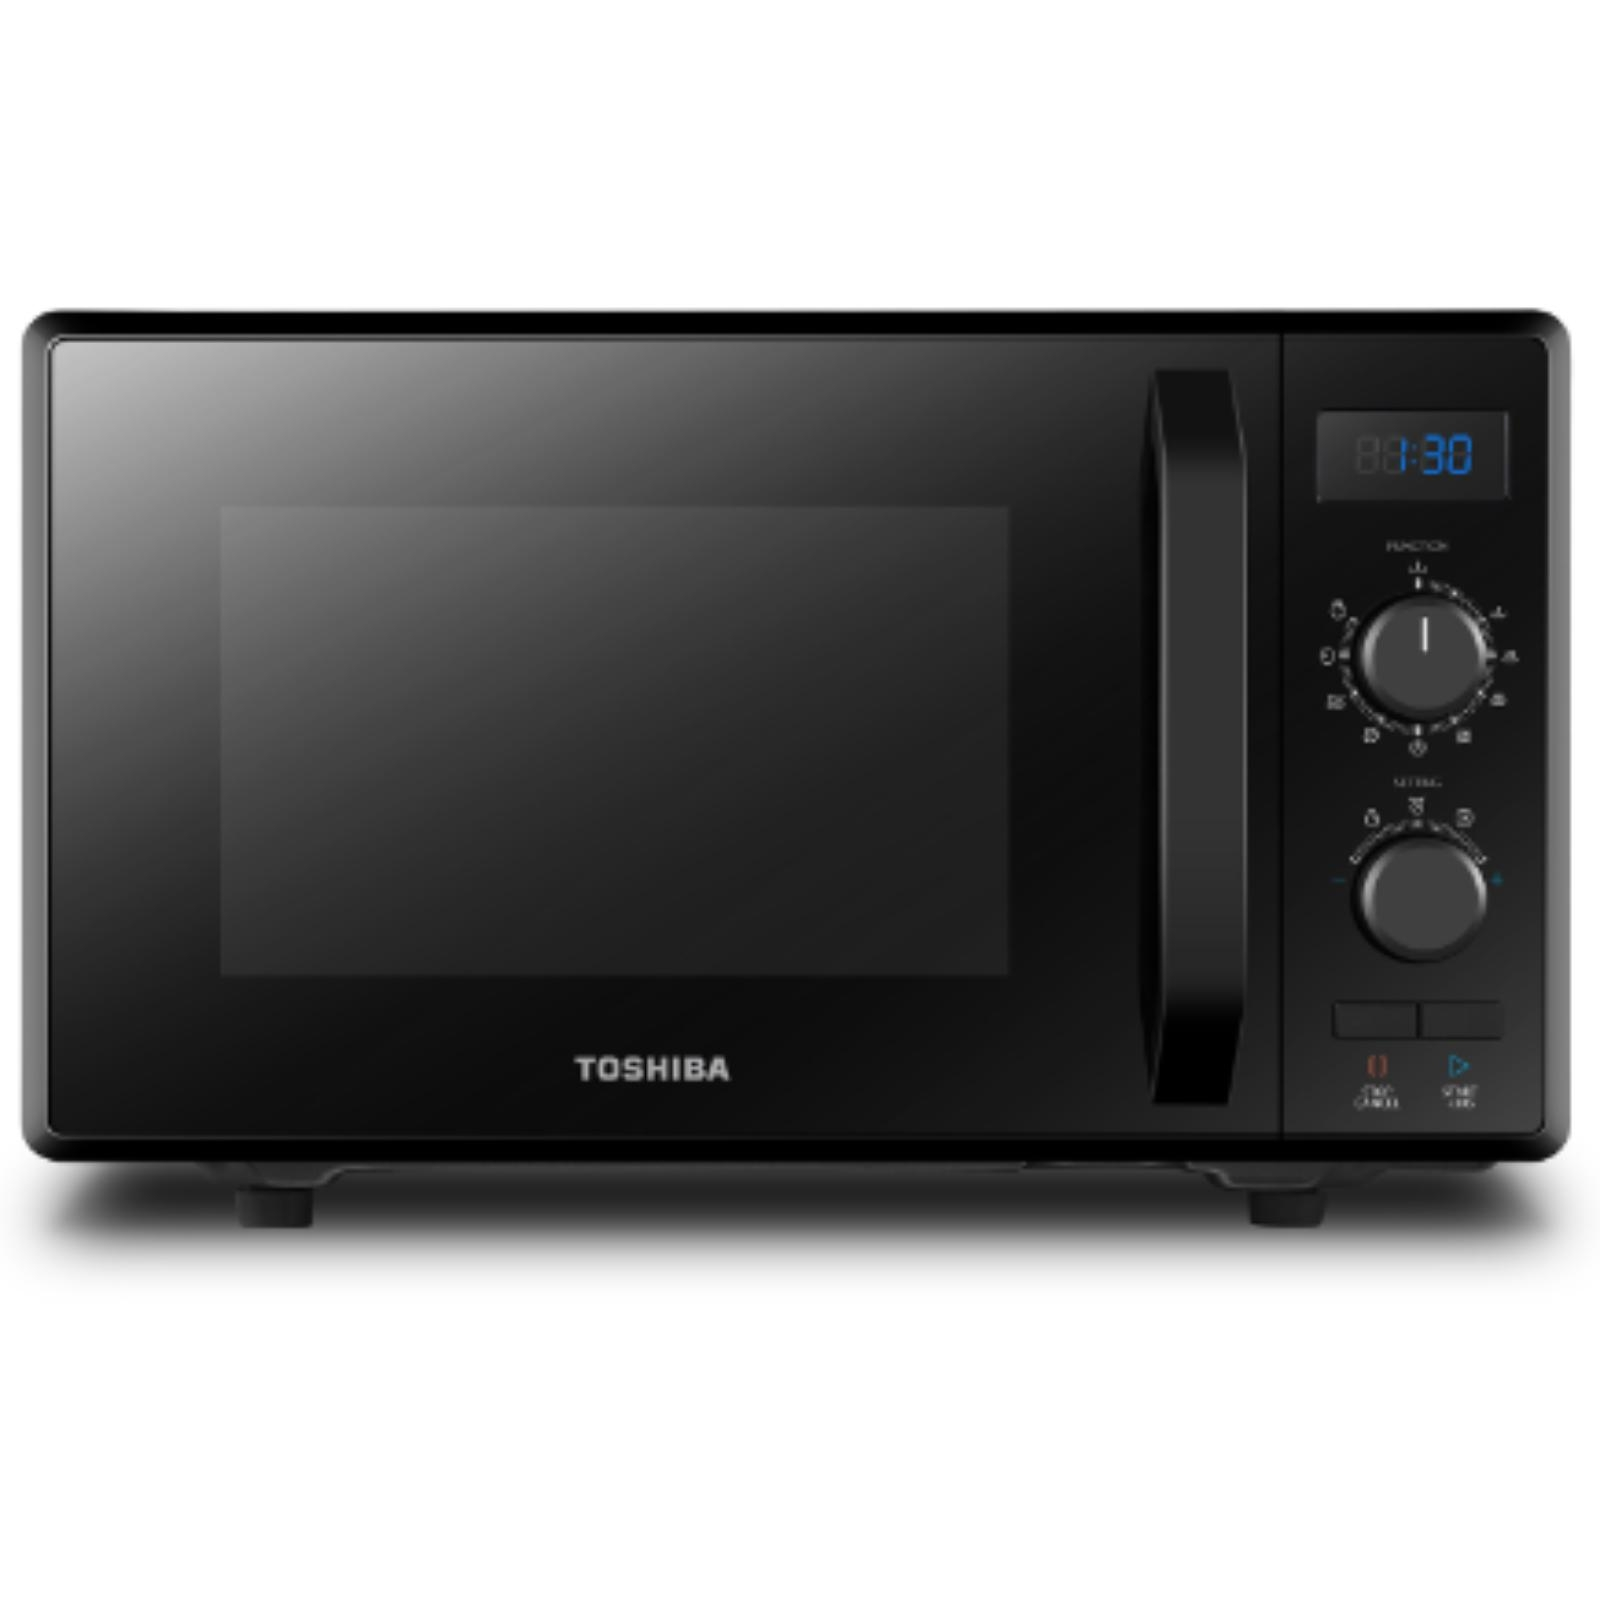 Cuptor cu microunde Toshiba MW2-AG23PBK, volum 23 L, afisaj digital, 900 W, 4 nivele putere, grill 1000 W, 8 programe auto cooking, iluminare LED, Negru